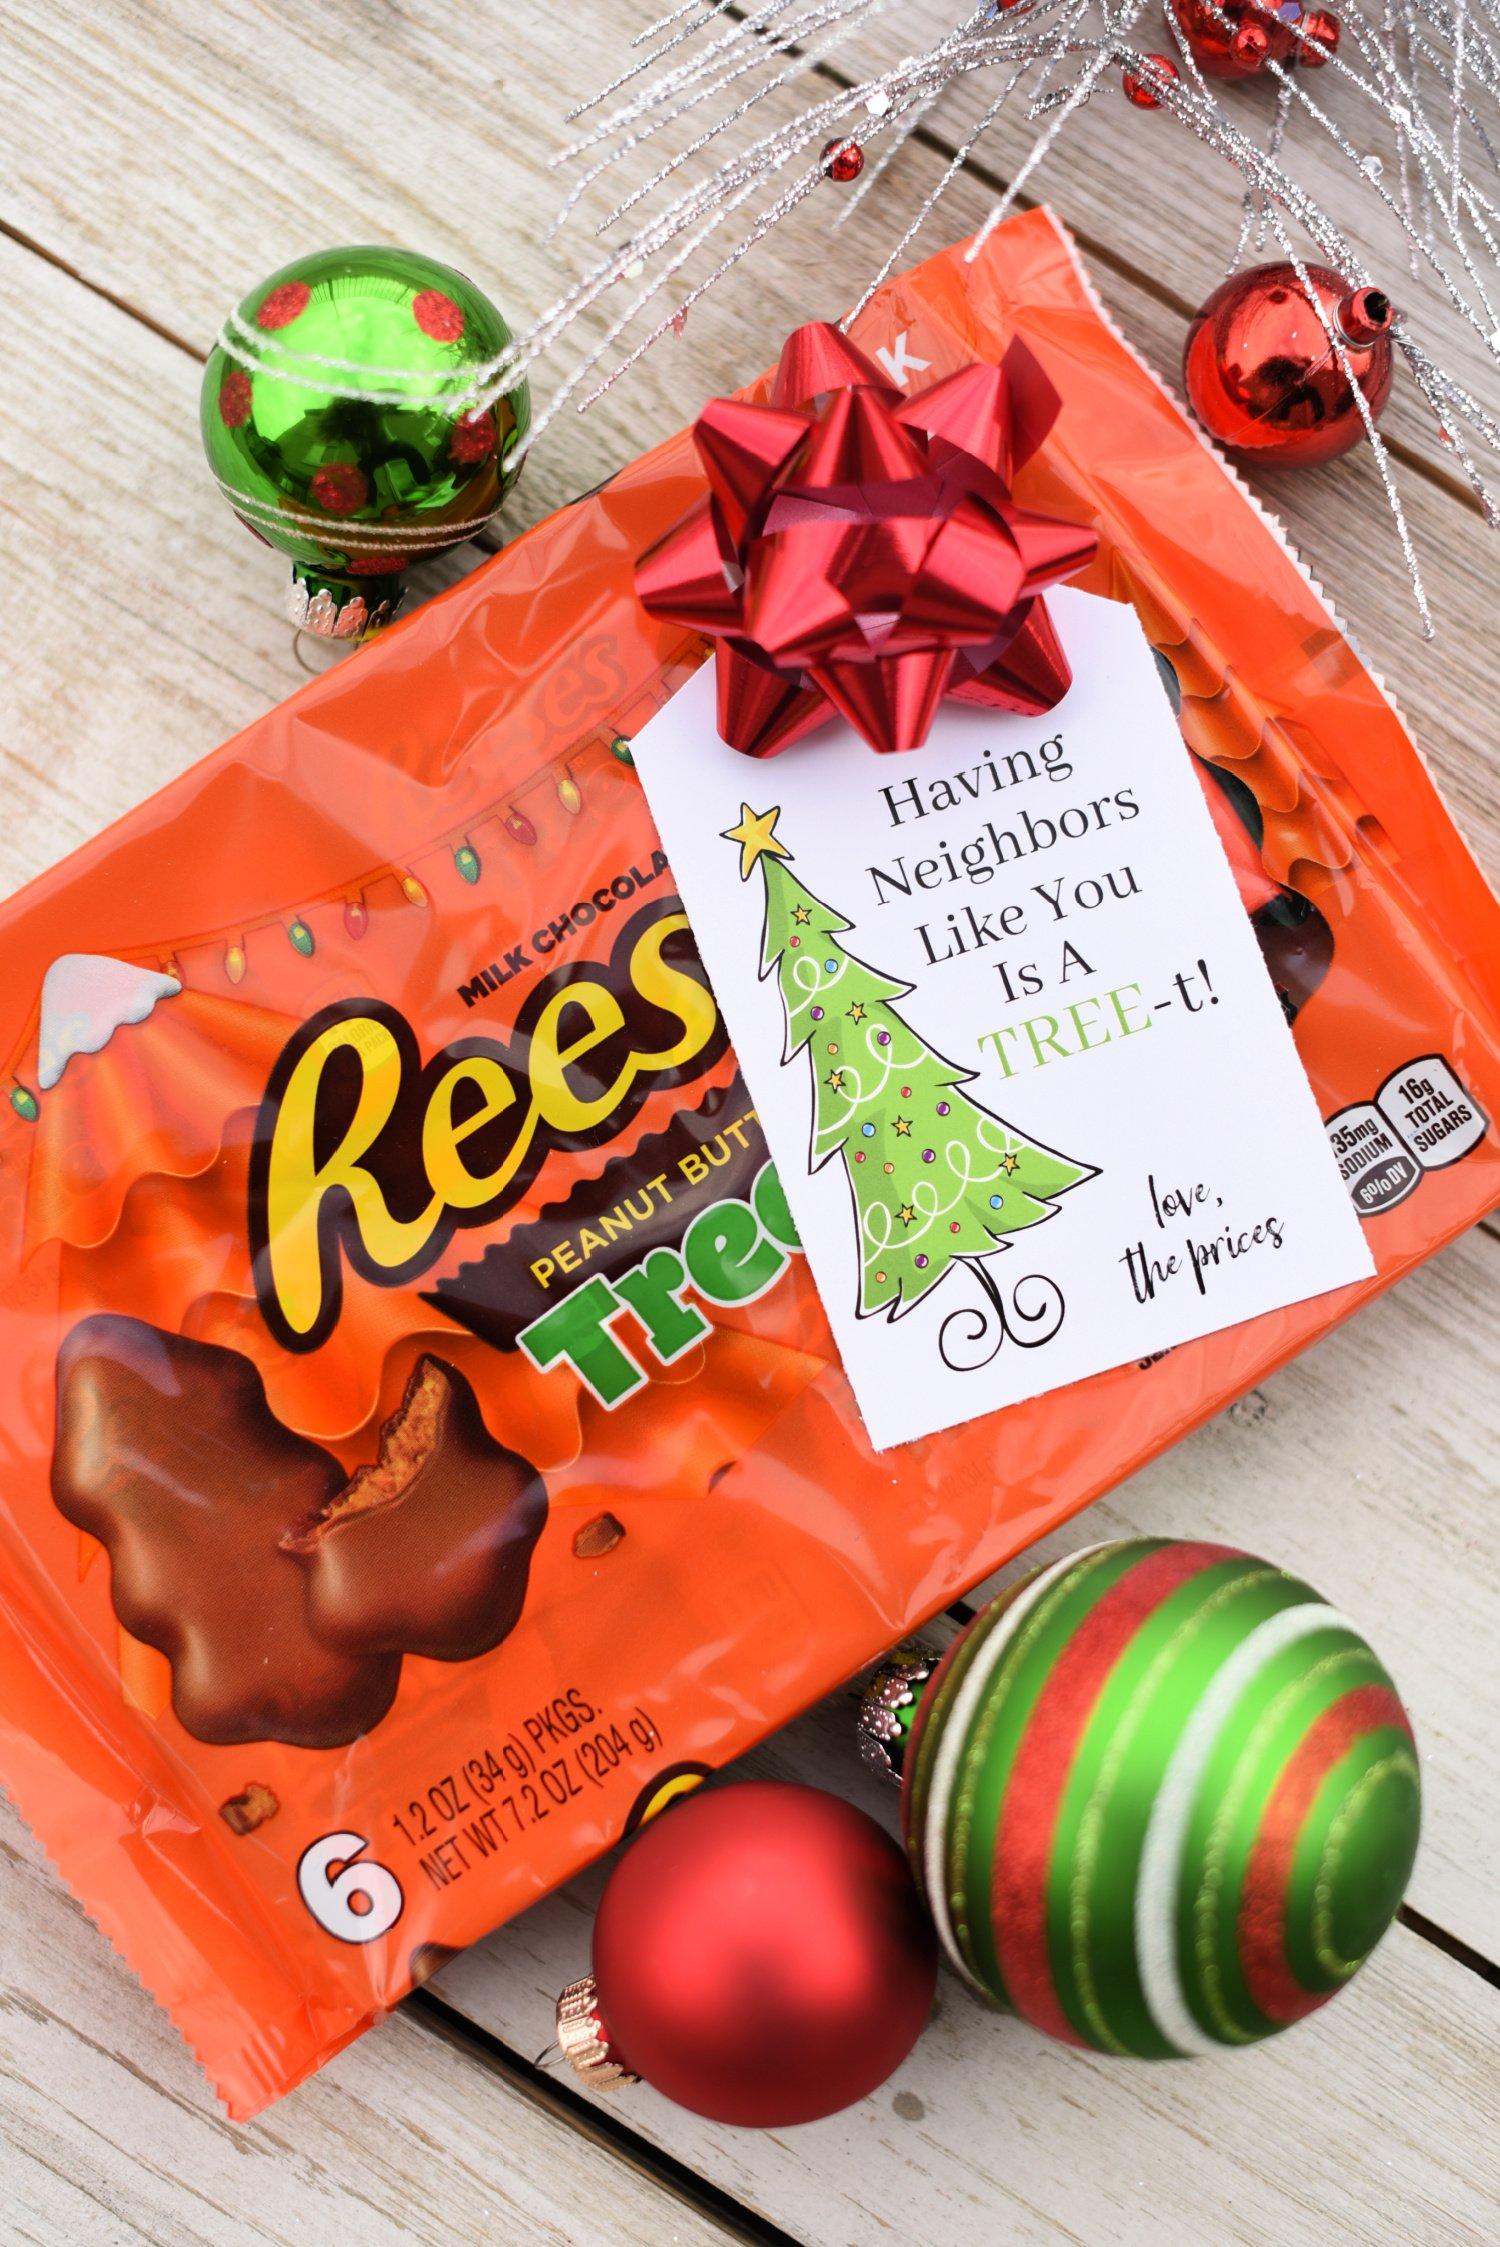 Reese's Neighbor Gift: Having Neighbors Like You is a Treat